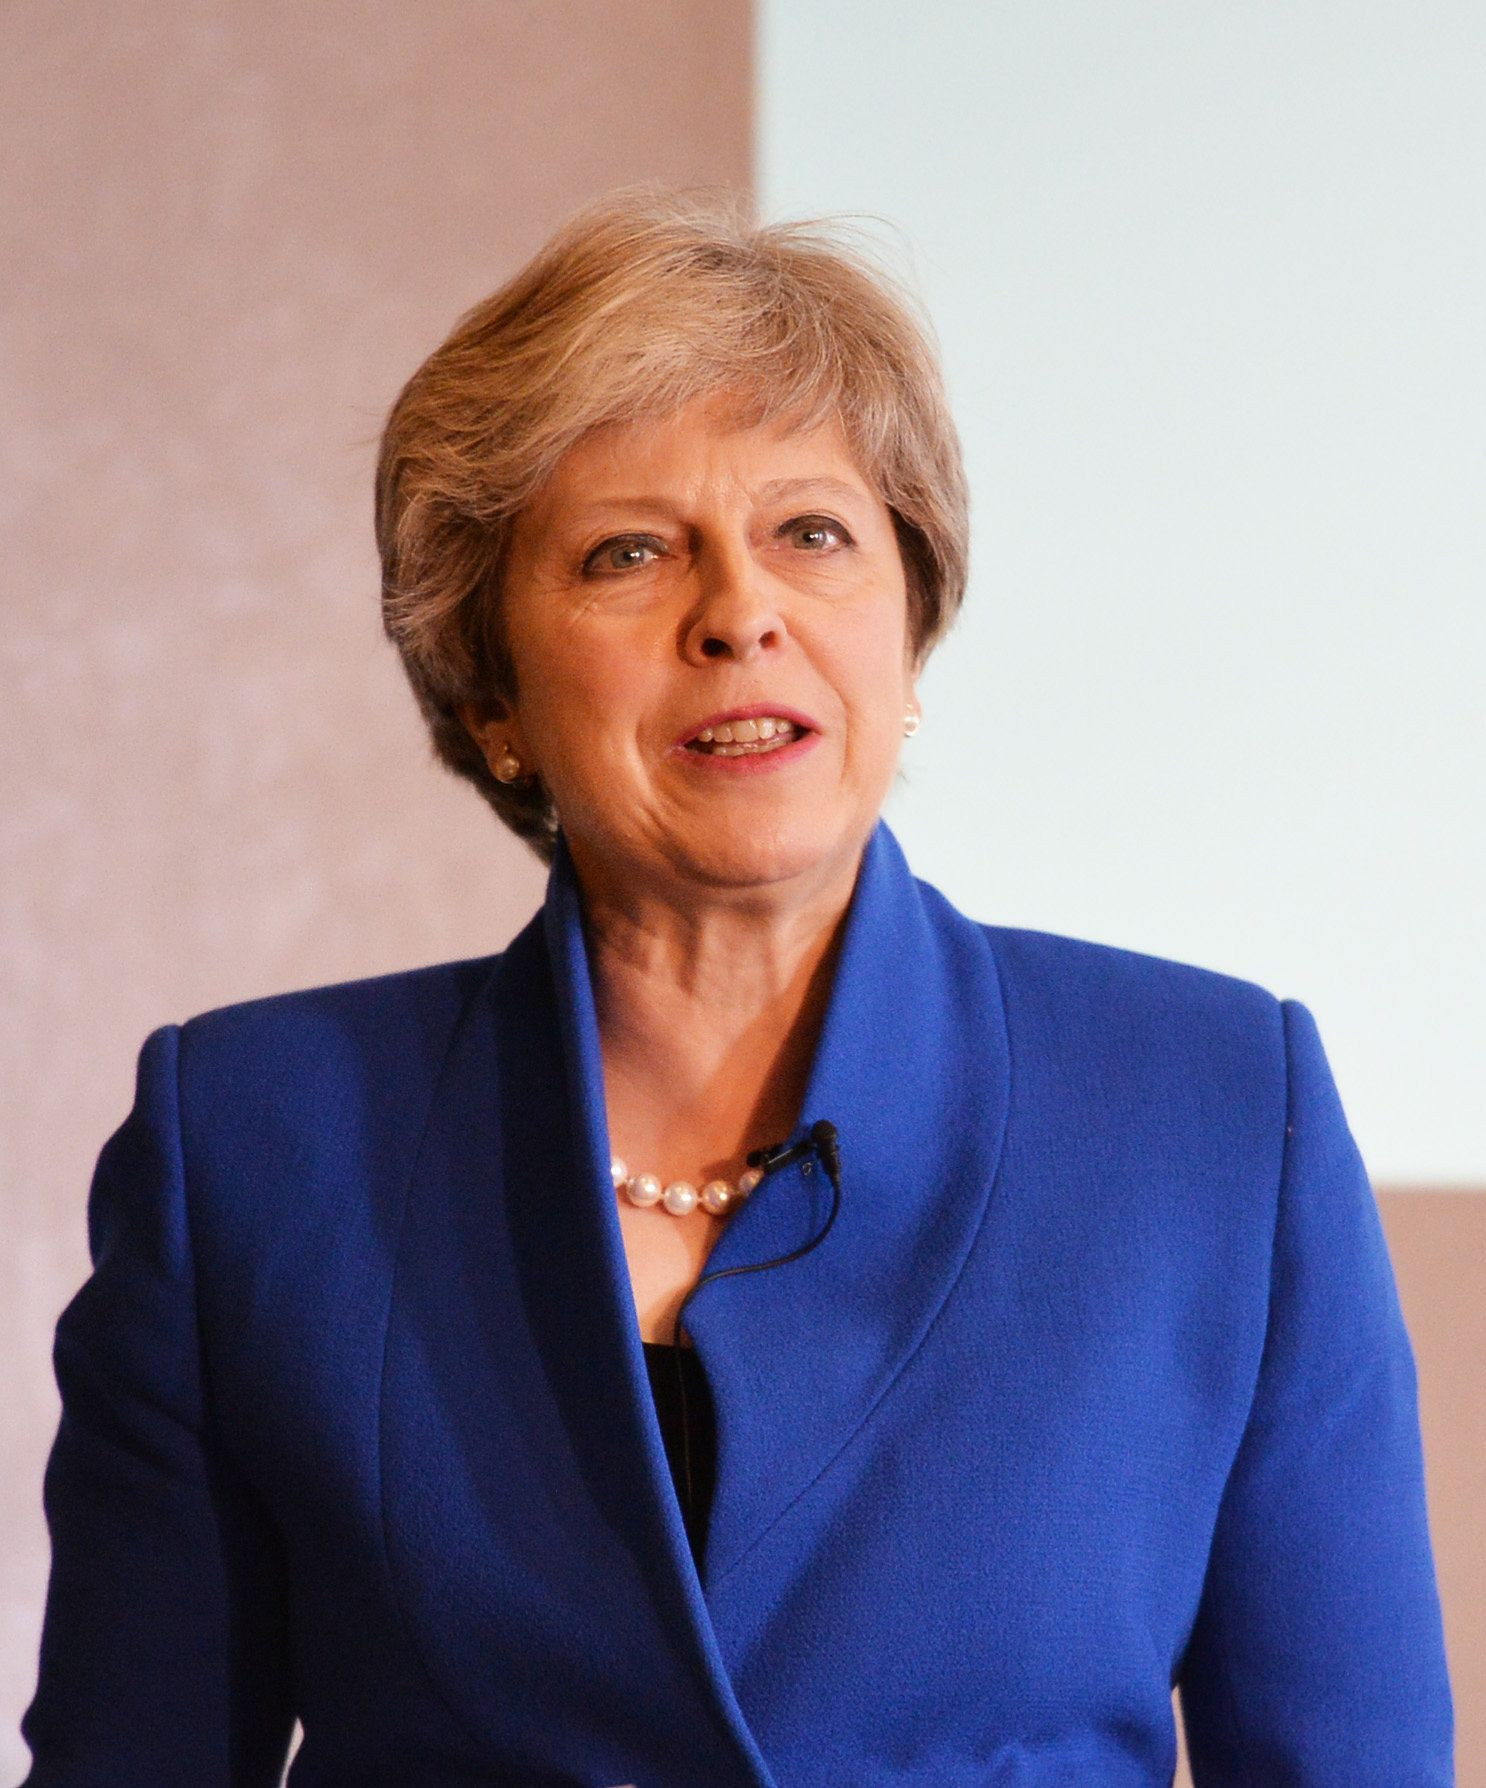 Tory Voters Back Radical Policies Like A Universal Basic Income - HuffPost UK